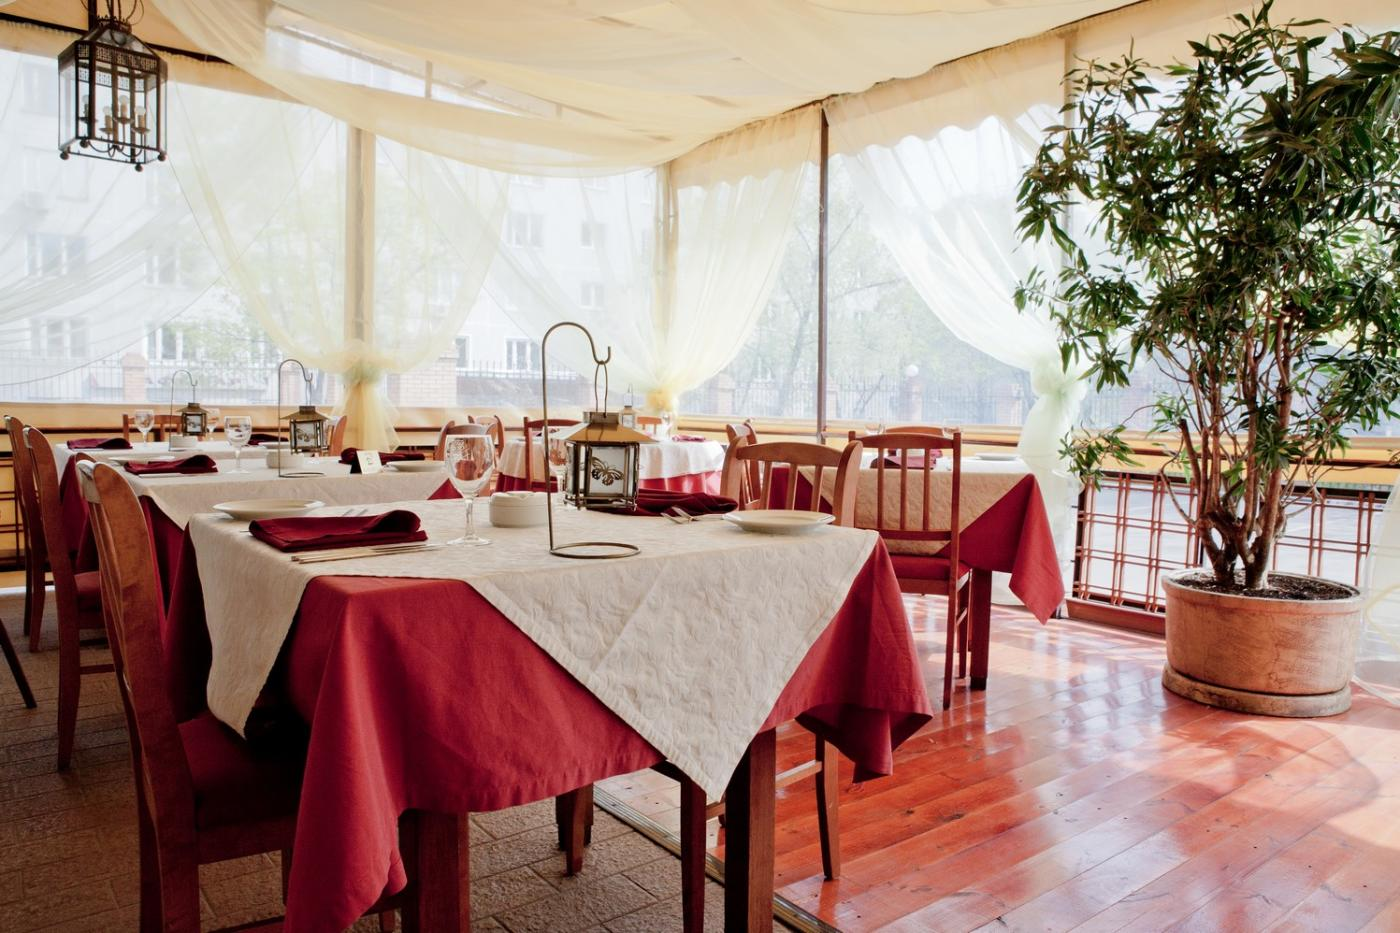 Итальянский Ресторан Чикко Клуб на Азовской (Cicco club) фото 3